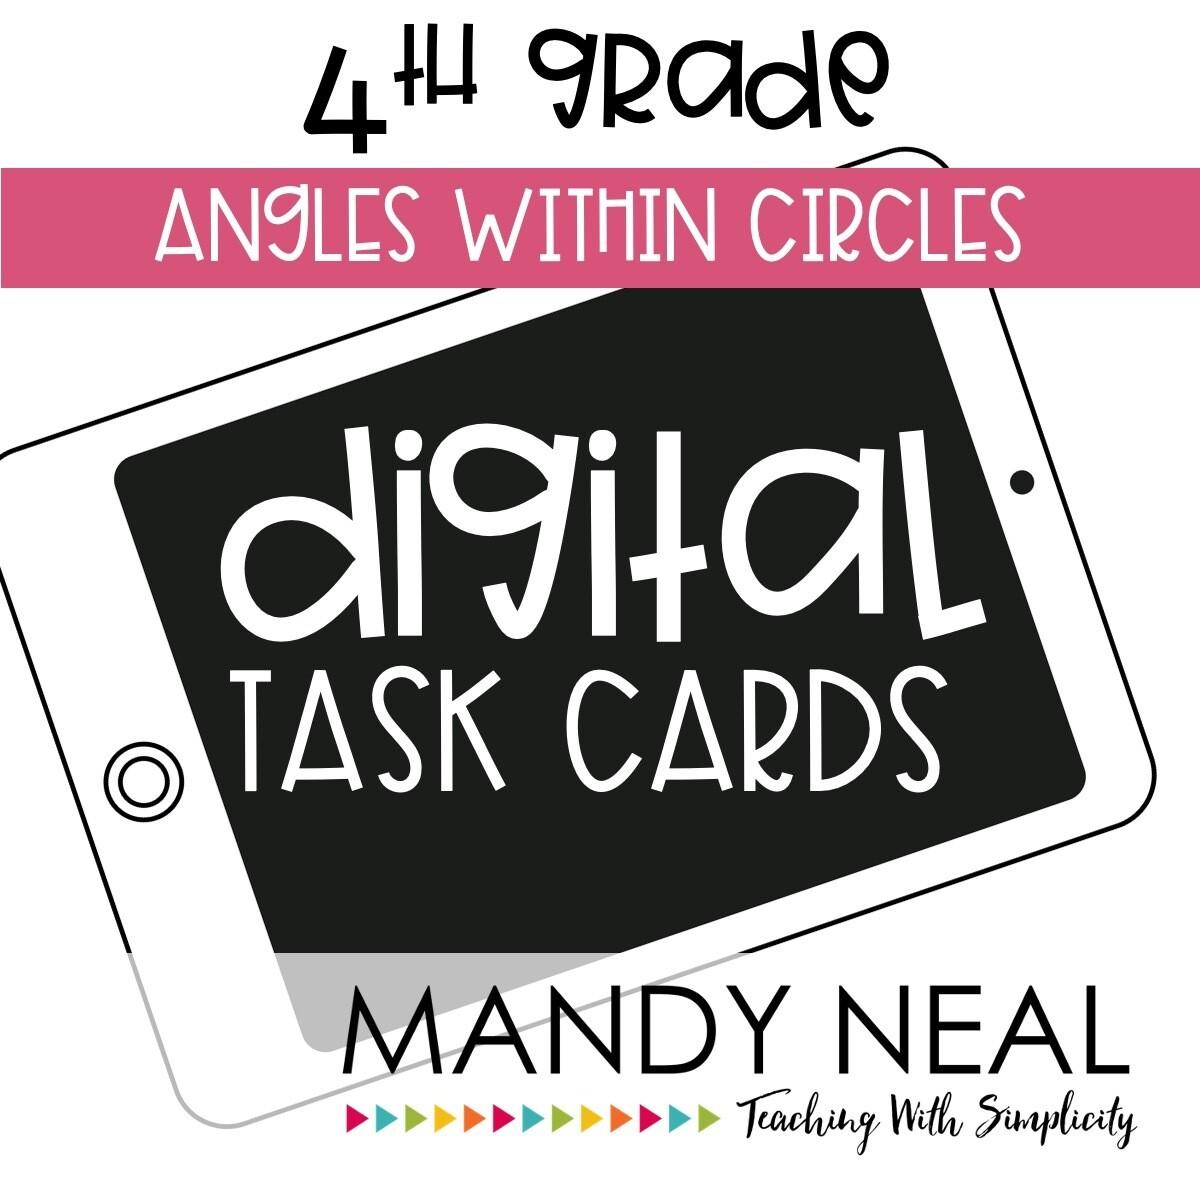 Fourth Grade Digital Math Task Cards ~ Angles Within Circles